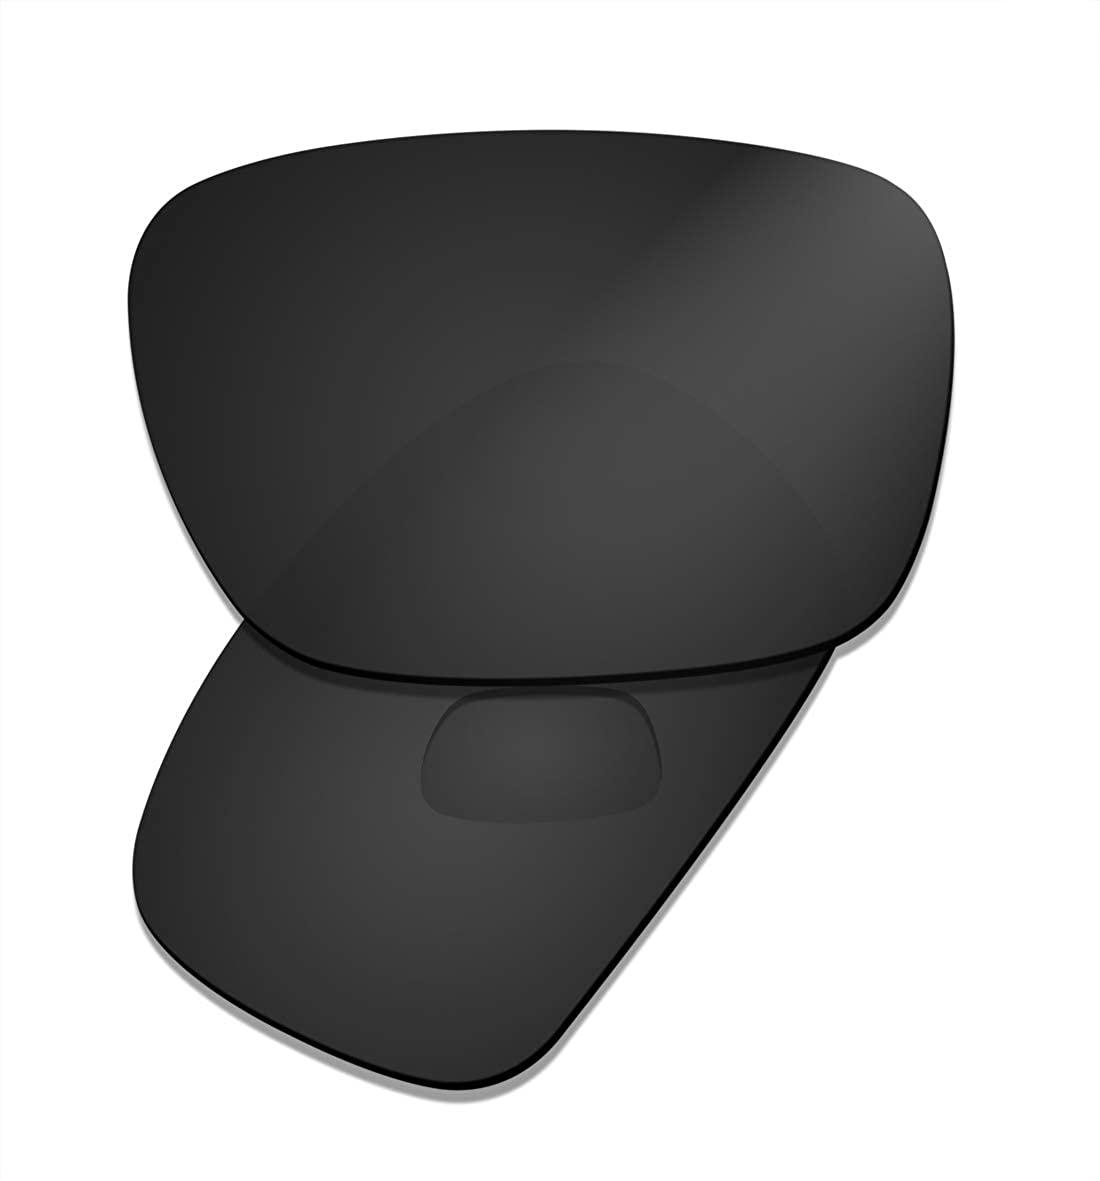 Prizo Polarized Replacement Lenses for Oakley Badman Sunglasses